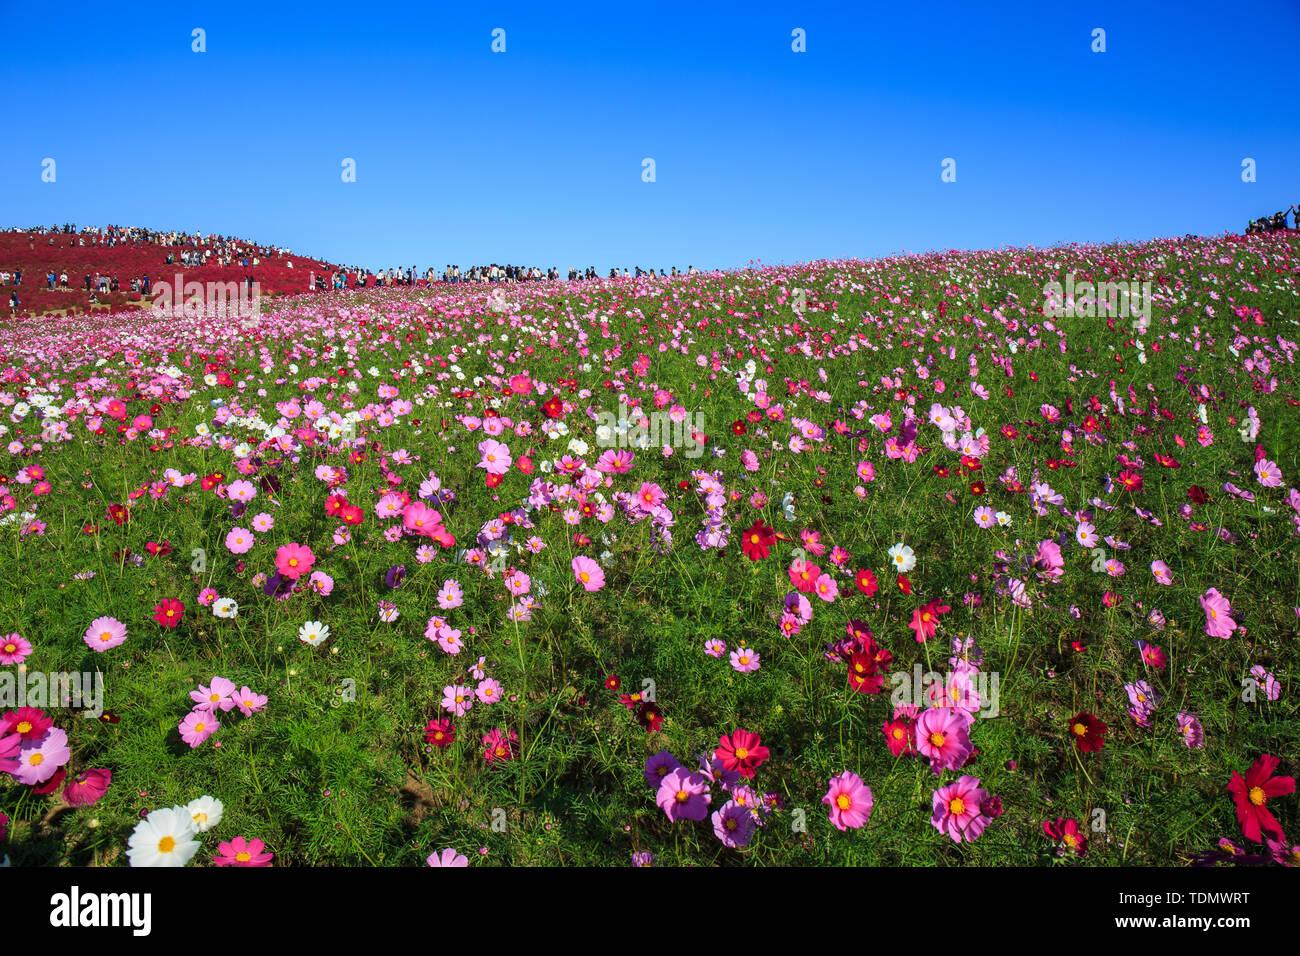 Cosmos flowers in Kokuei Hitachi Seaside Park - Hitachinaka, Ibaraki, Japan Stock Photo